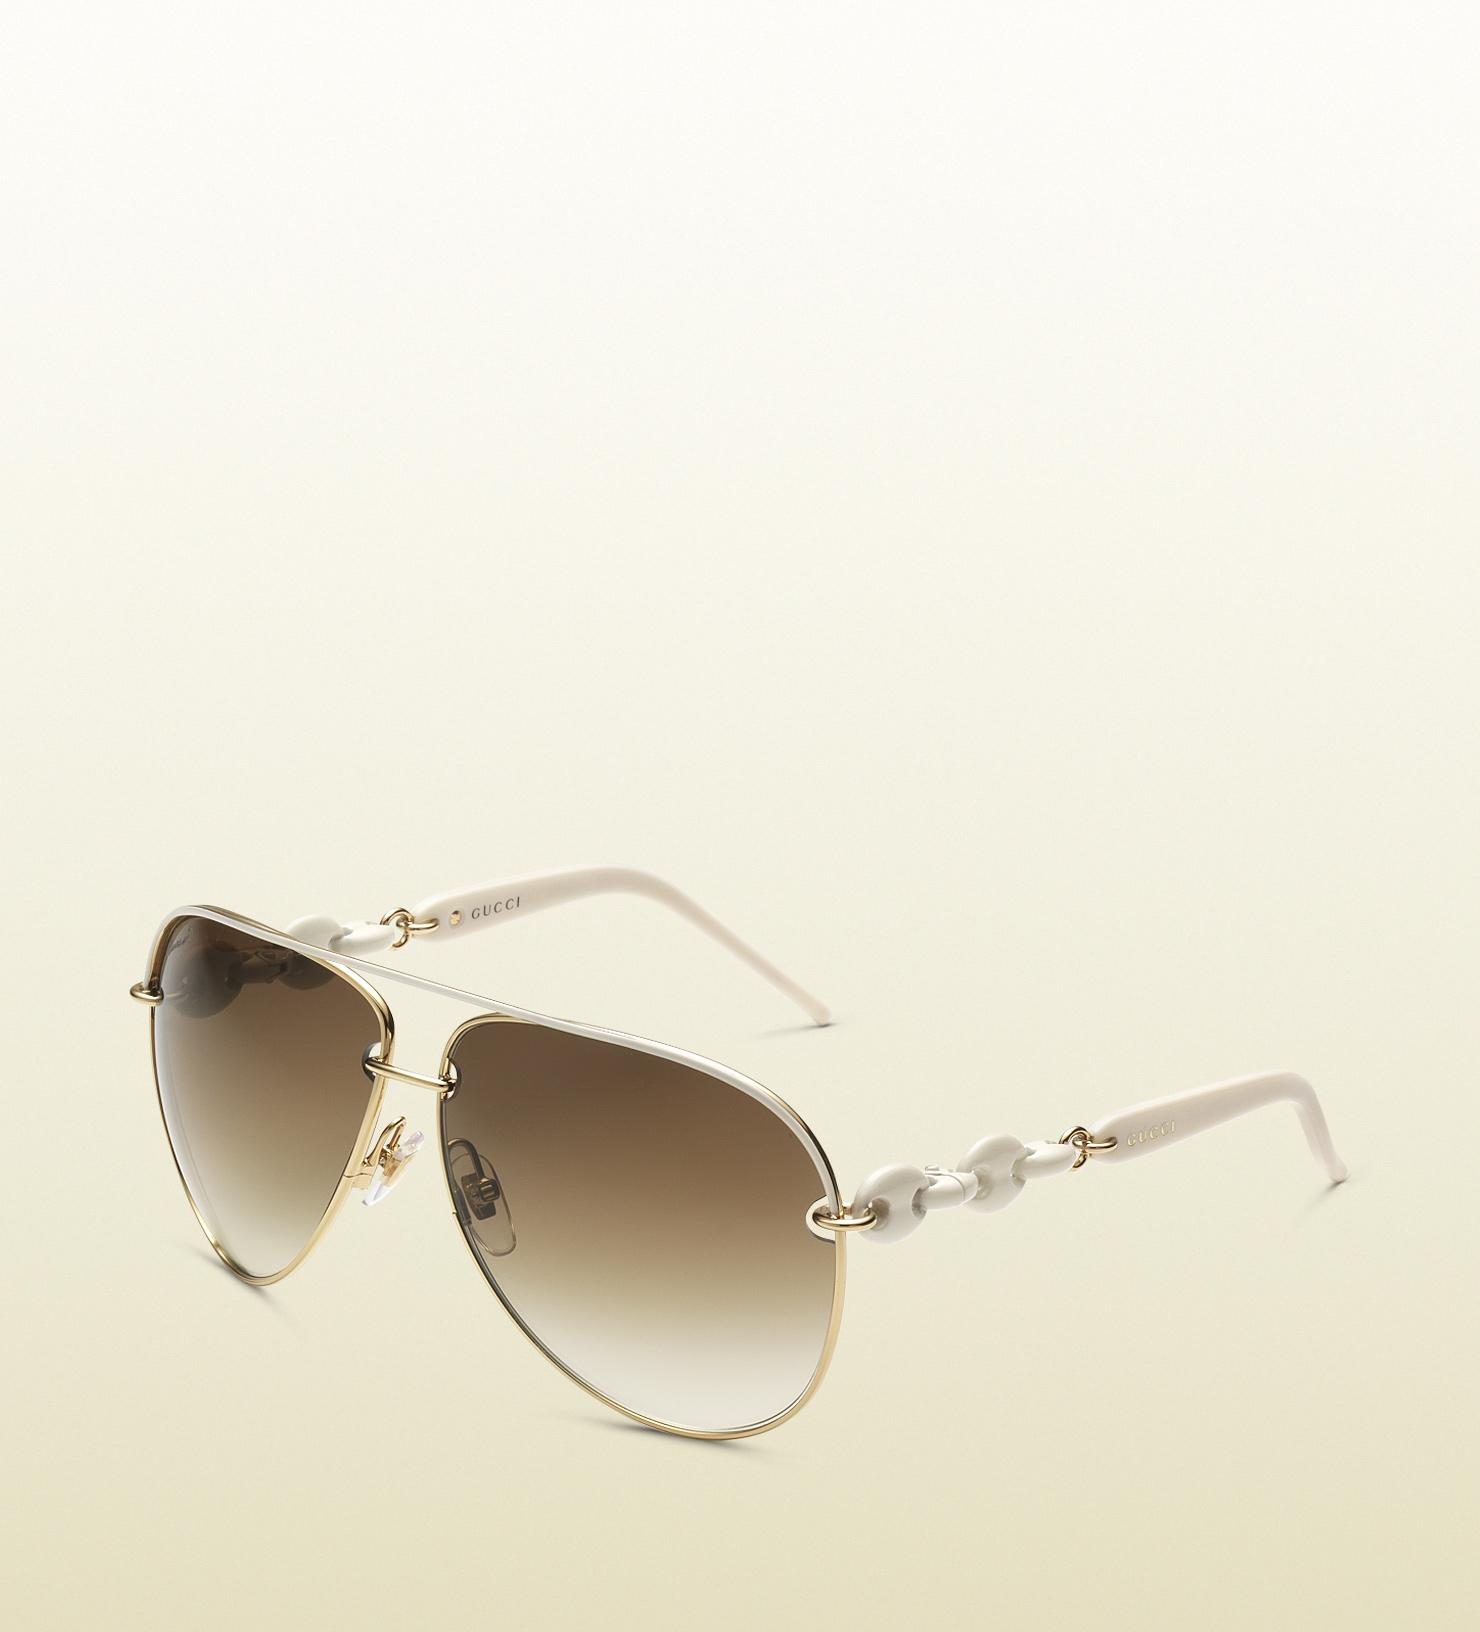 Lyst Gucci Womens White Aviator Sunglasses In White